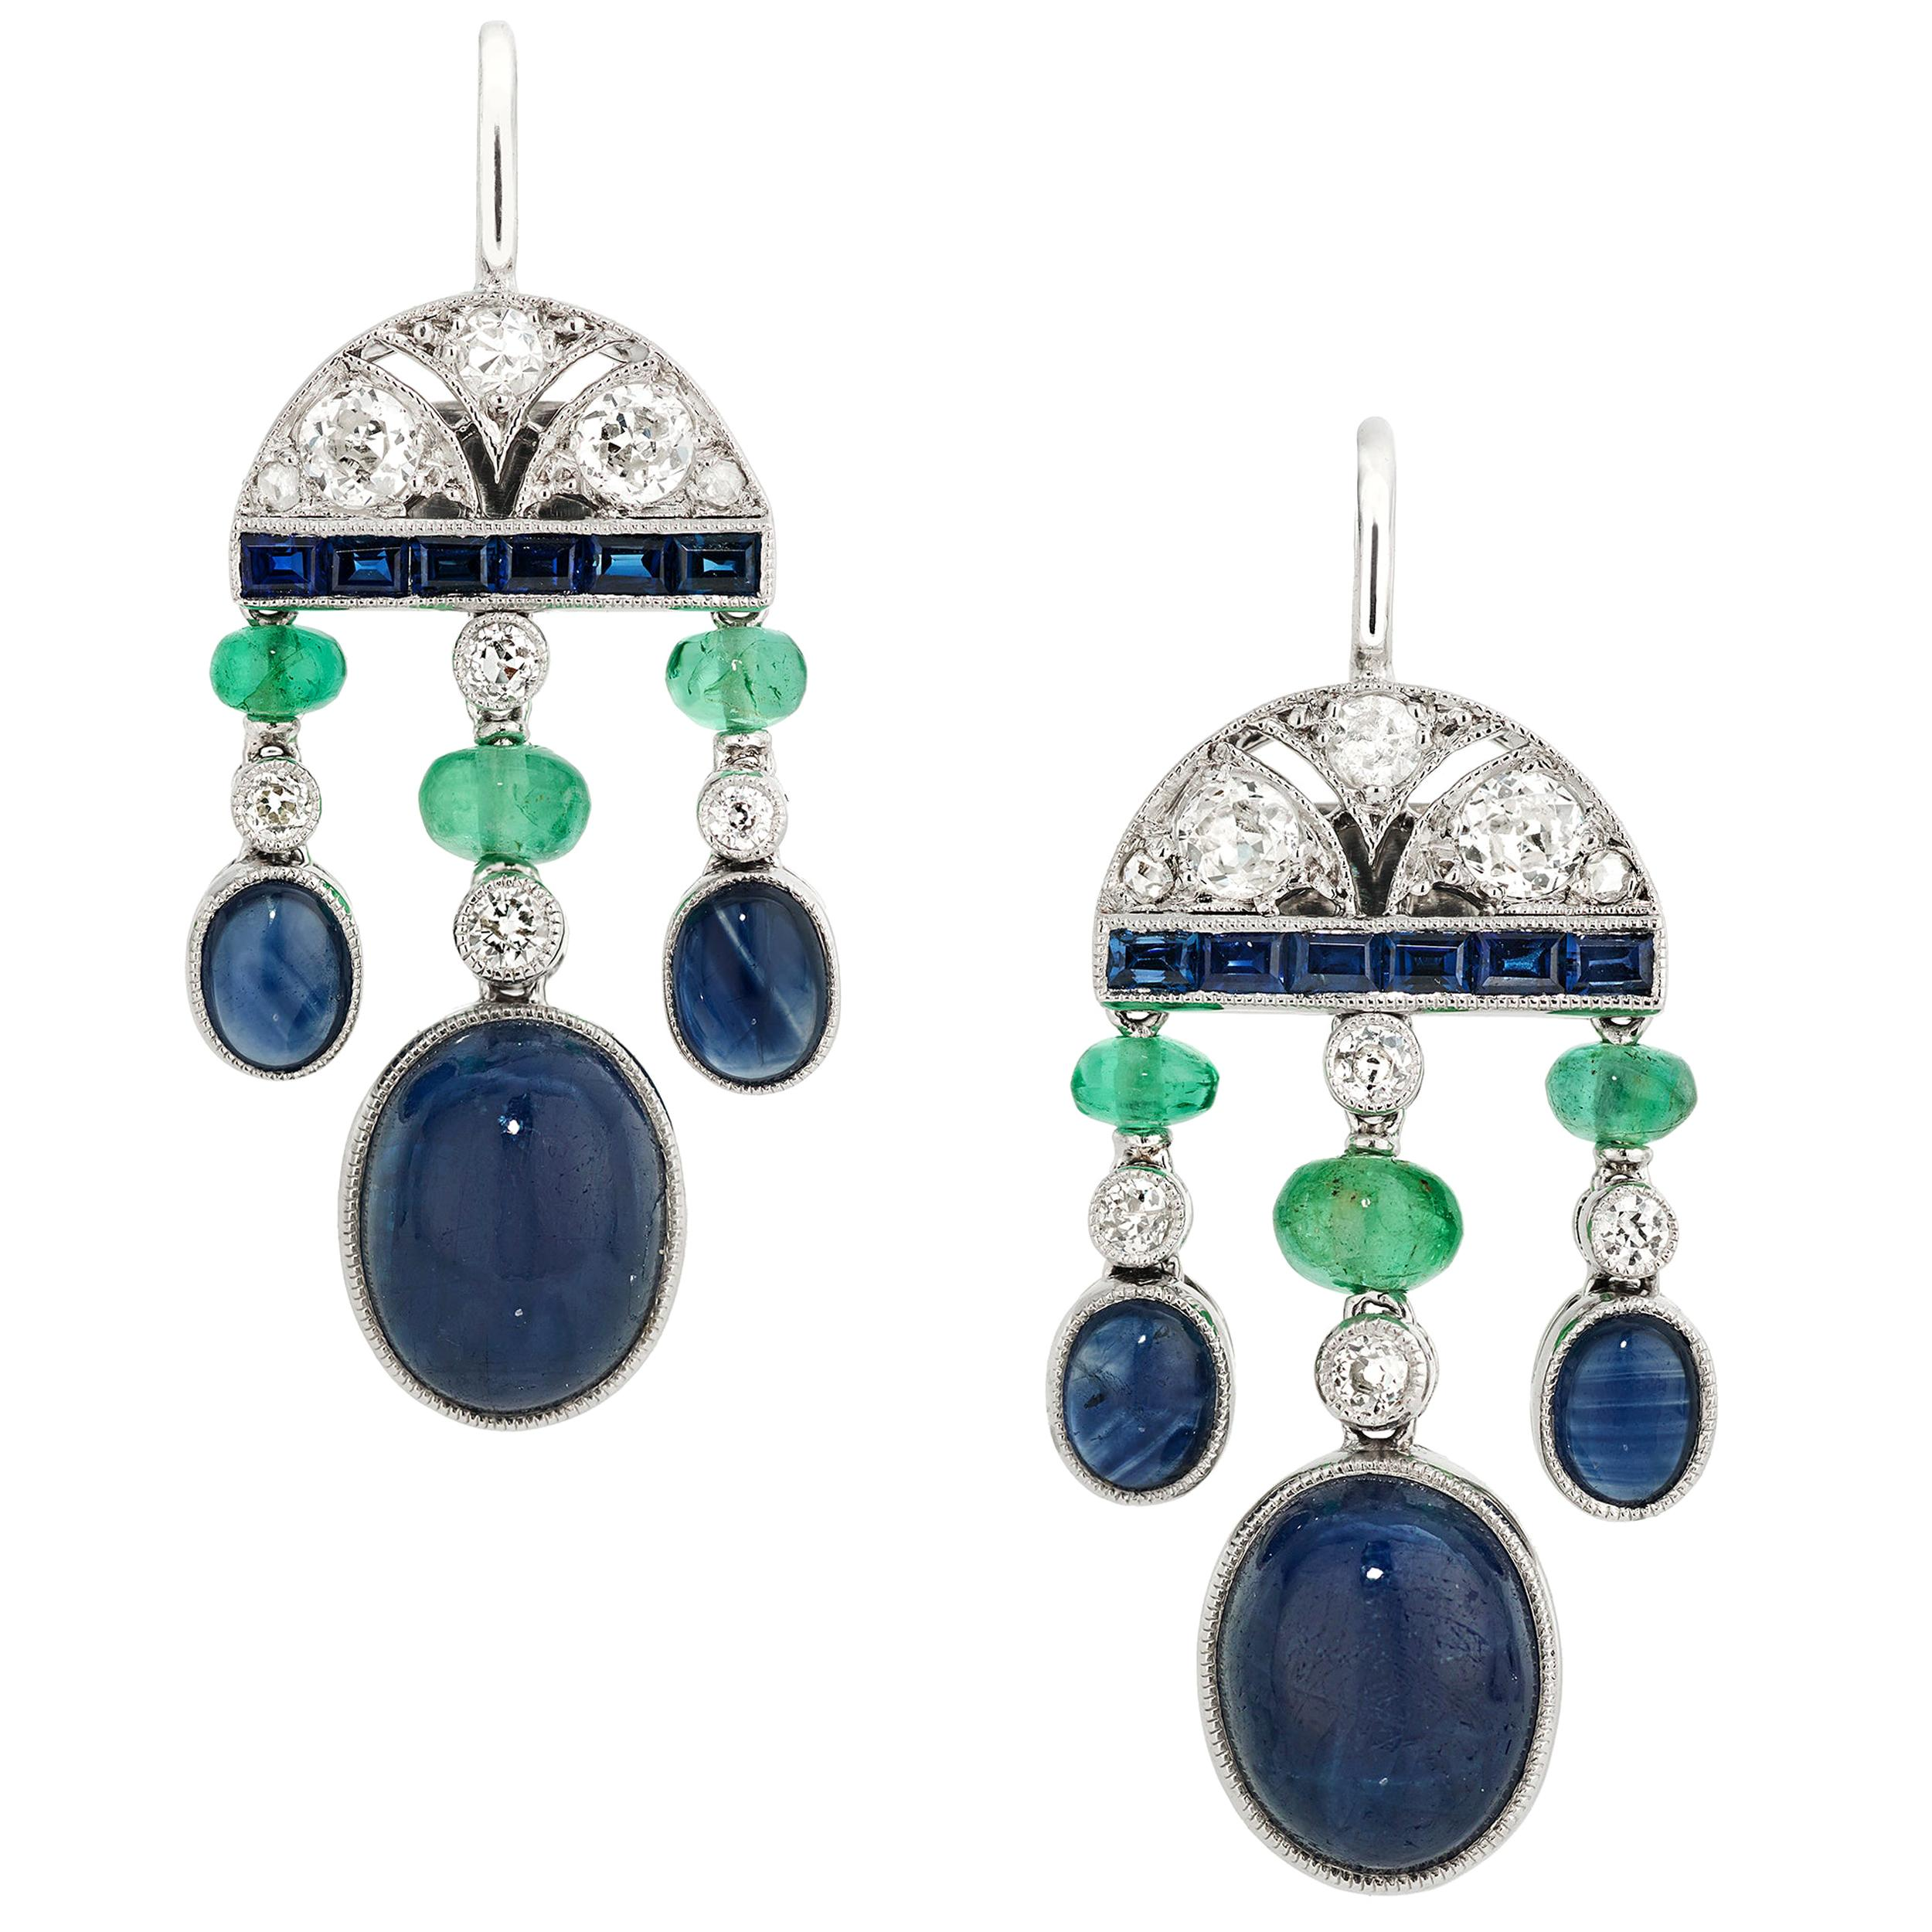 6.60 Carat Sapphire, Emerald, and Diamond Art Deco Style Earrings in Platinum